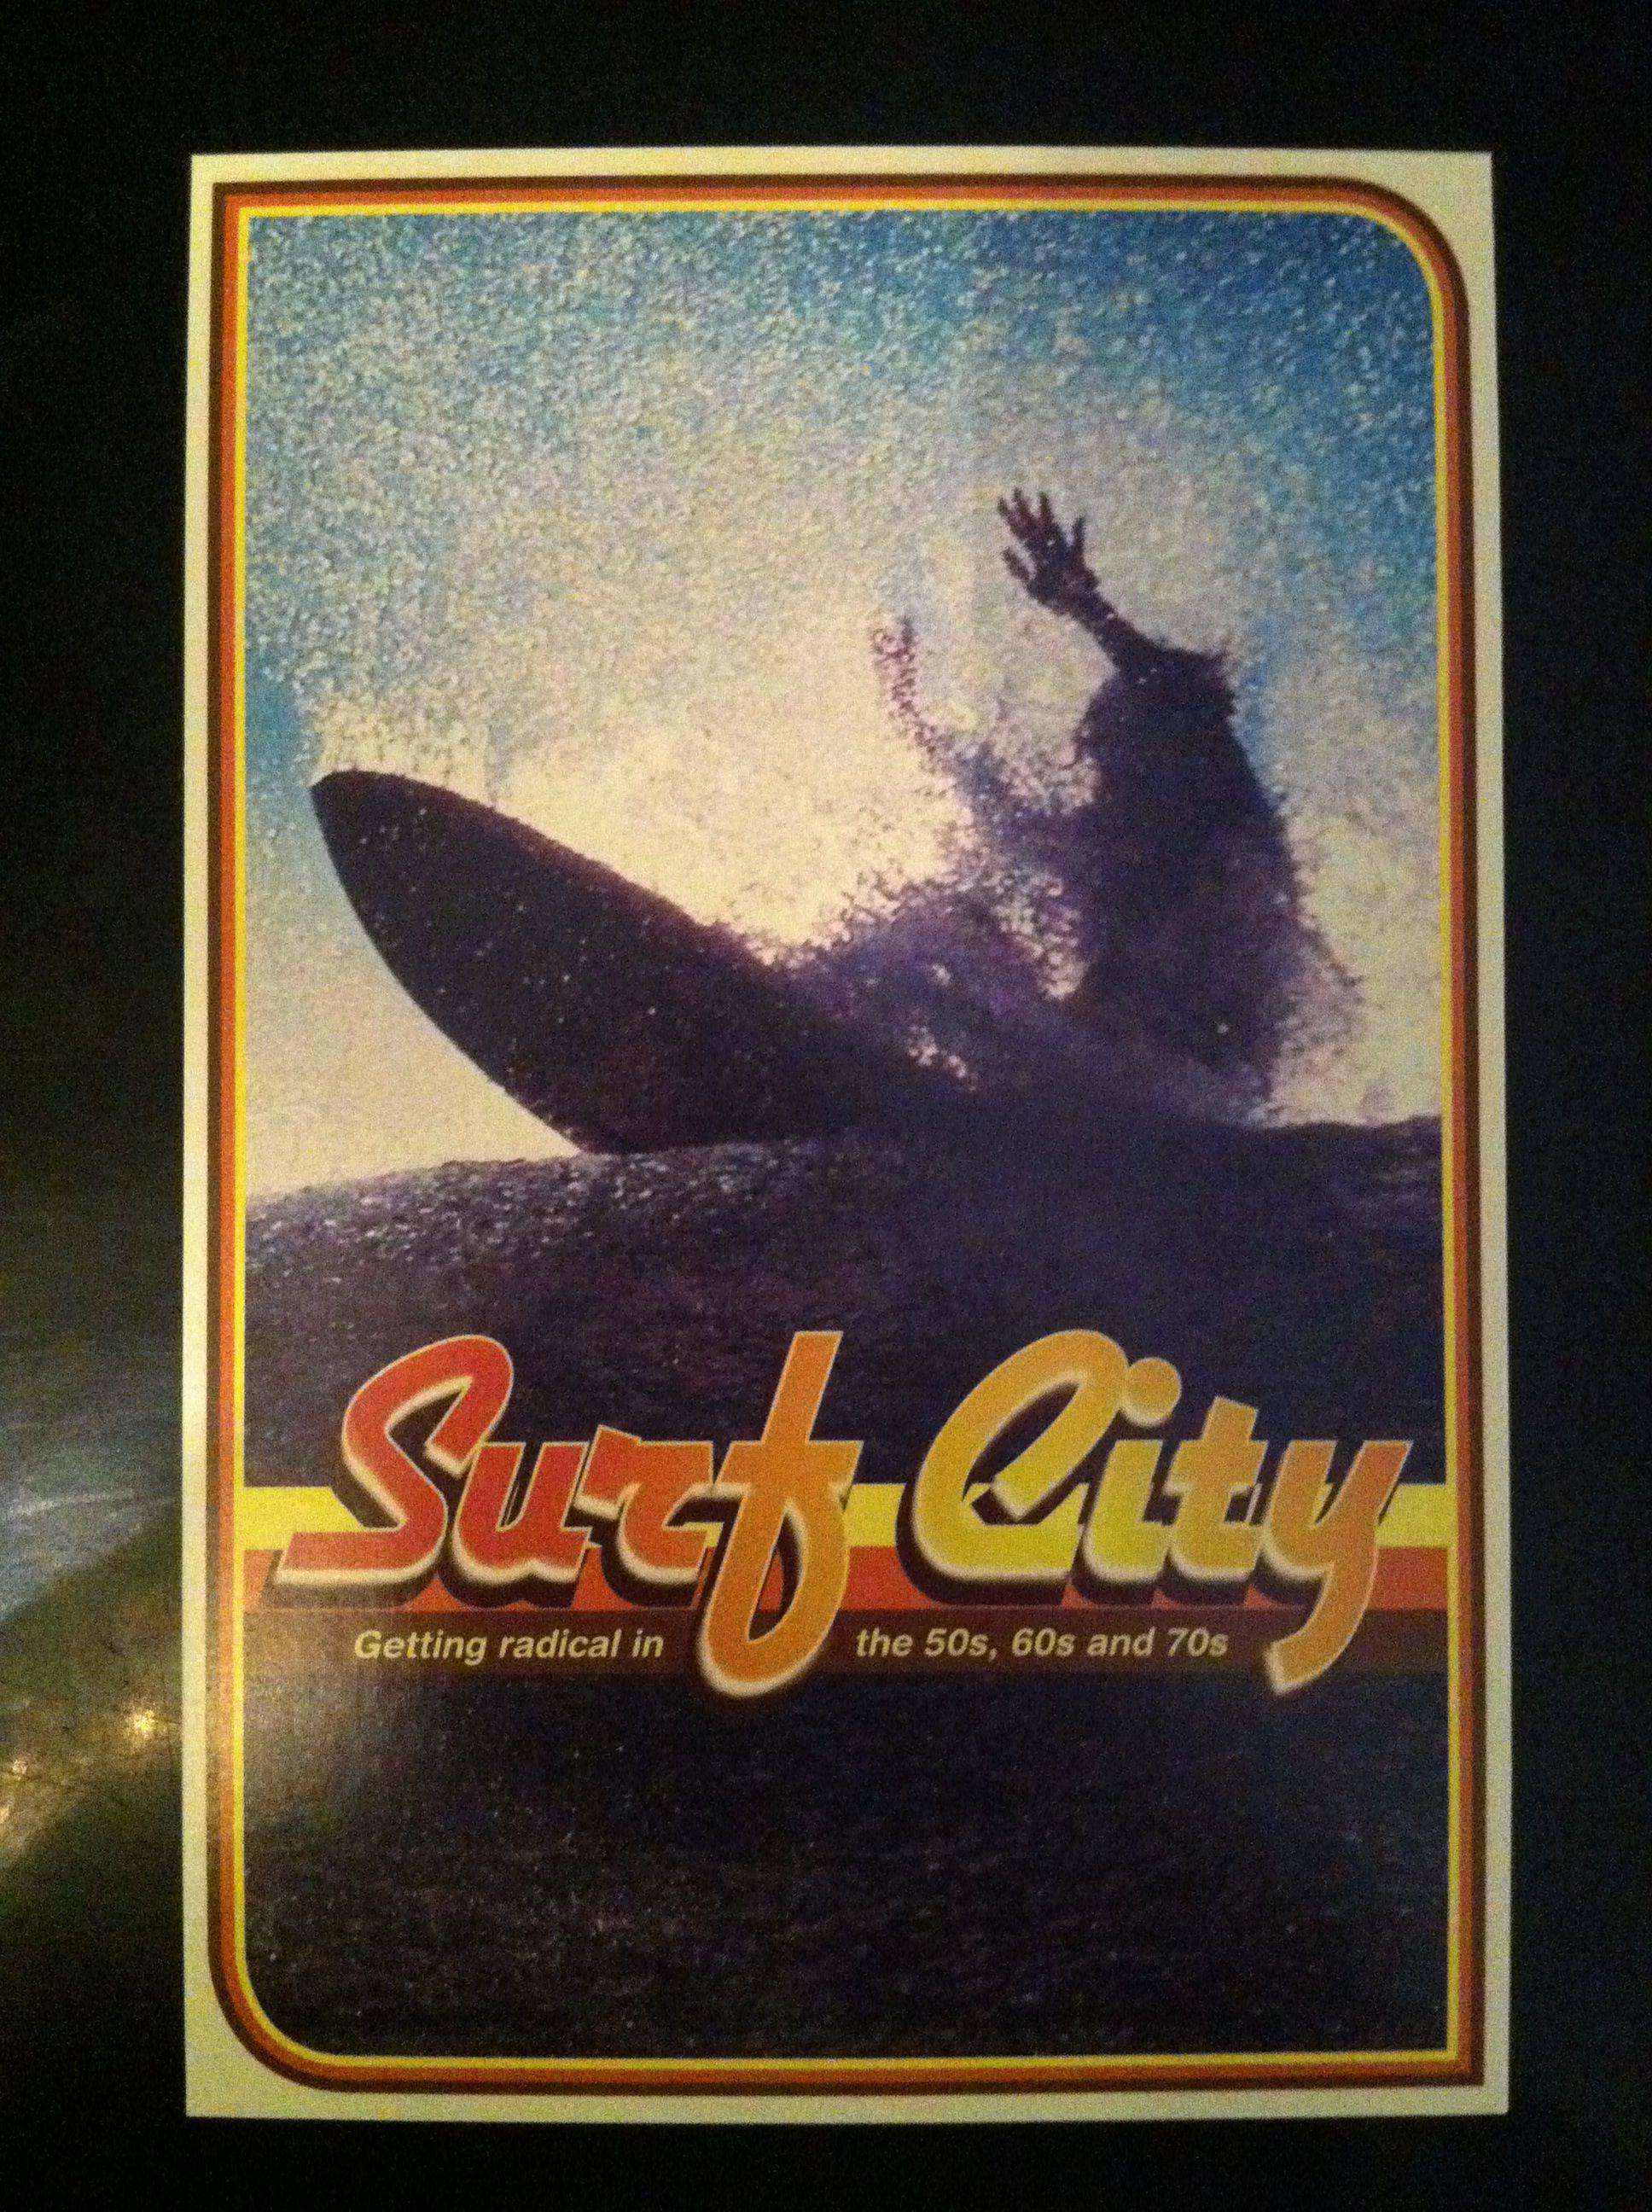 Surf City Exhibition / Museum of Sydney